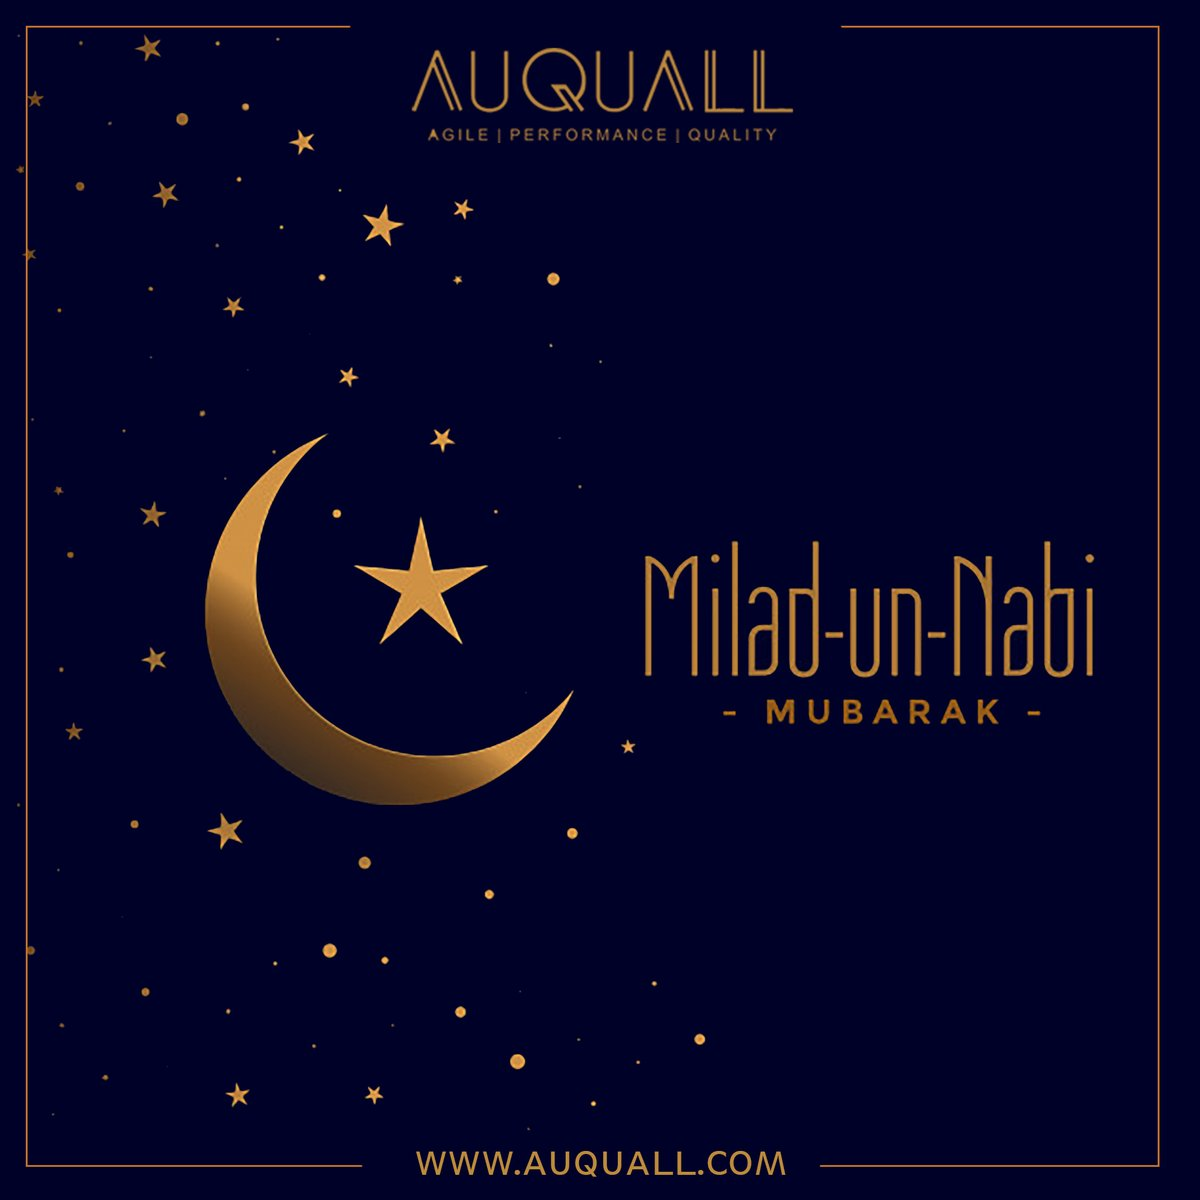 May Allah bless you with all that you have wished for. Eid Milad-Un-Nabi  #eid #eidmubarak #ramadan #islam #love #muslim #fashion #eidoutfit #pakistan #eidcollection #allah #instagram #eidgifts #eiduladha #eidaladha #idulfitri #instagood #lebaran #hijab #eidulfitr #stayhome https://t.co/dthEPBp4AI